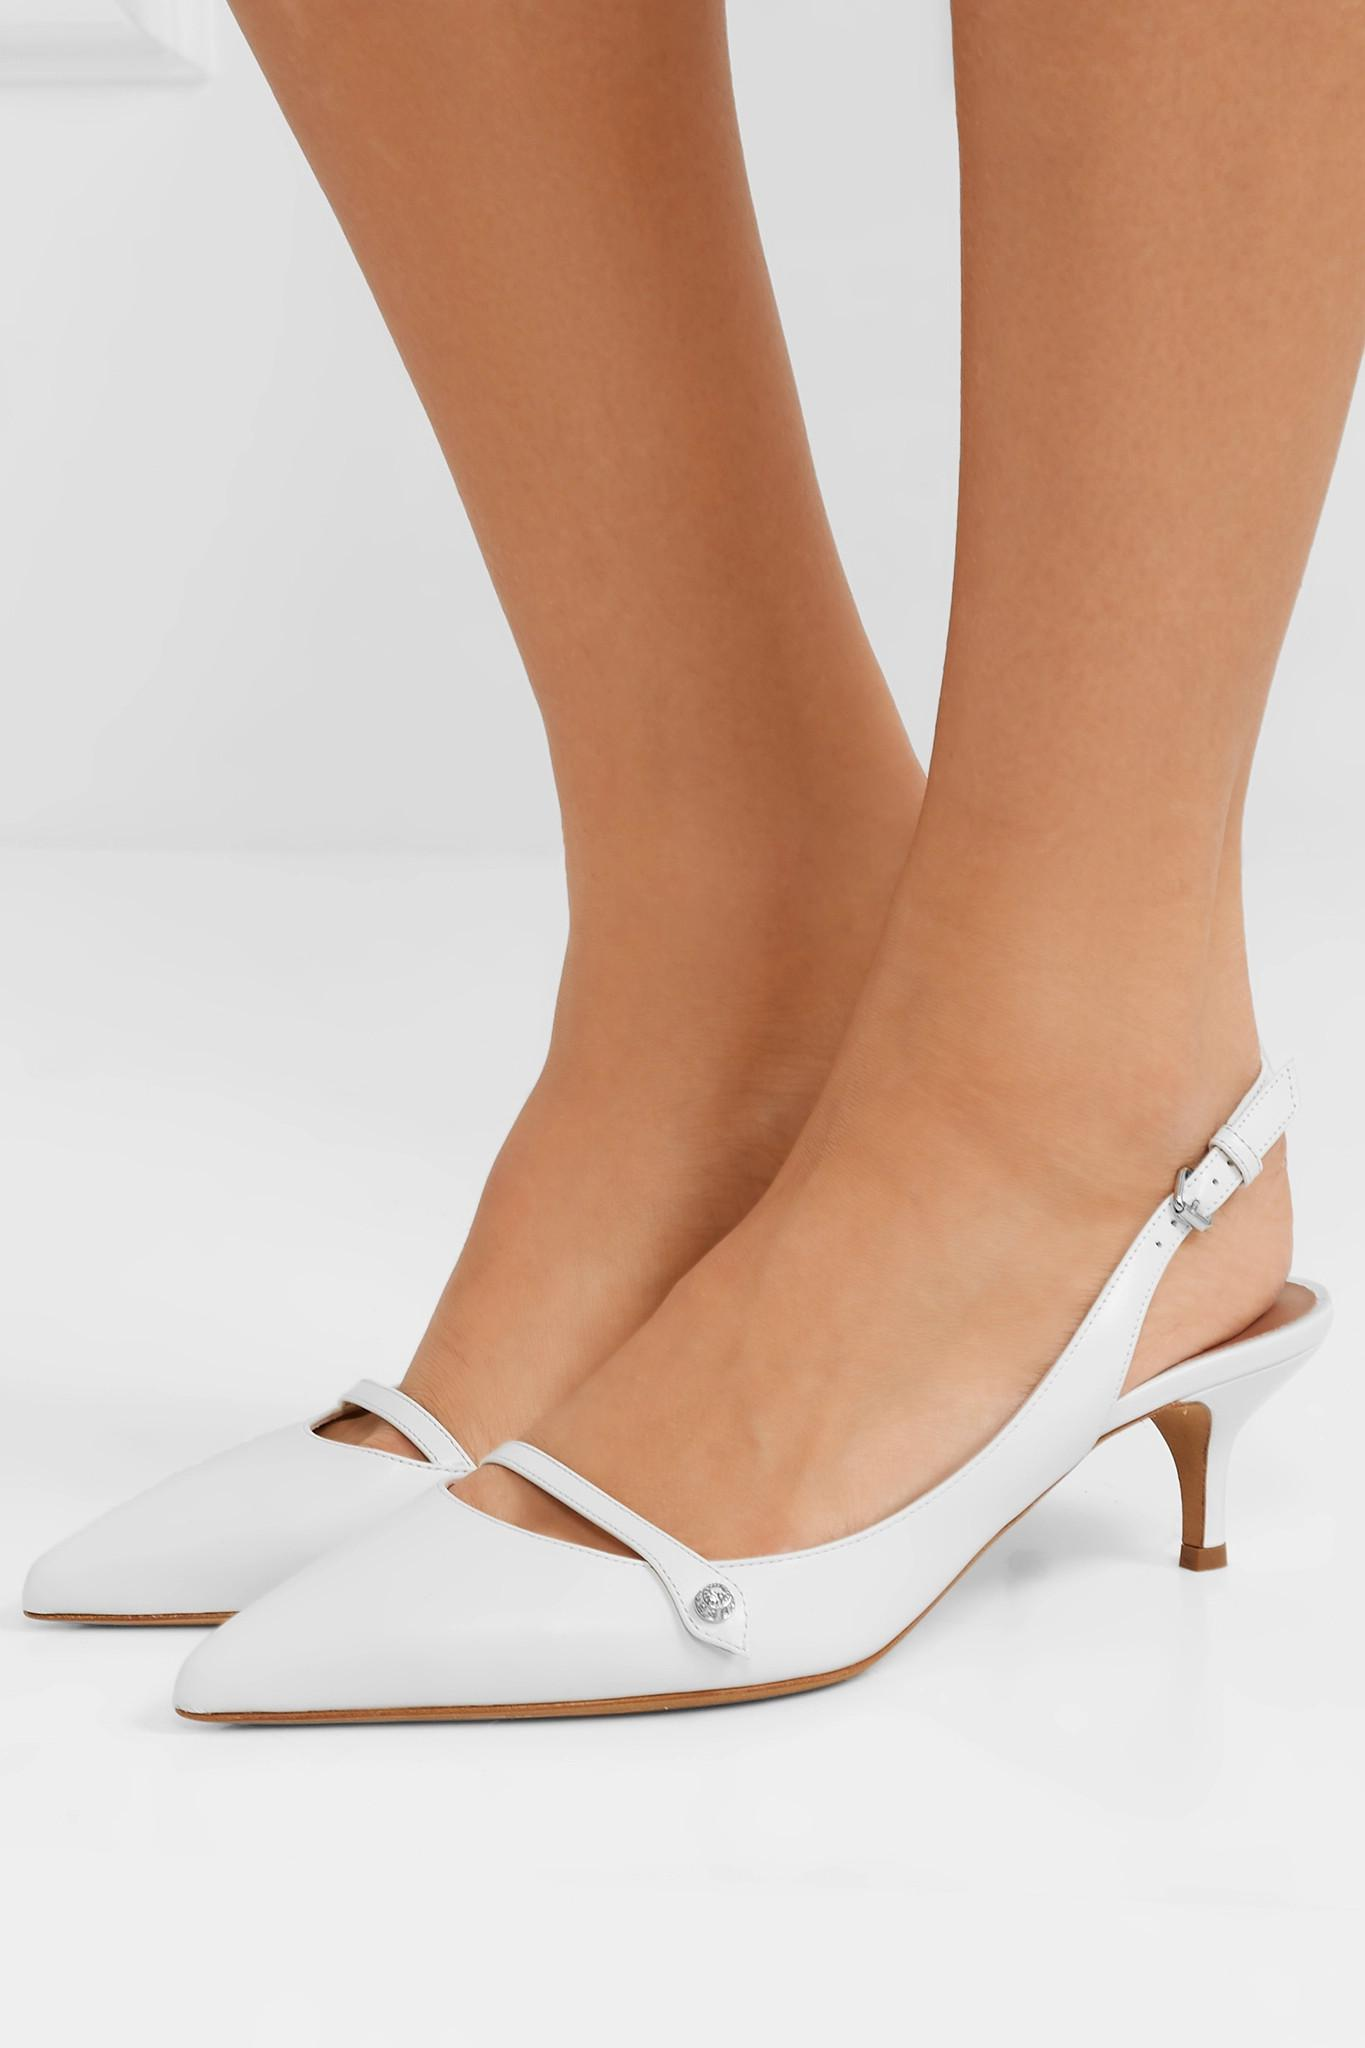 36fa7d2b719 Tabitha Simmons - White Layton Crystal-embellished Leather Slingback Pumps  - Lyst. View fullscreen